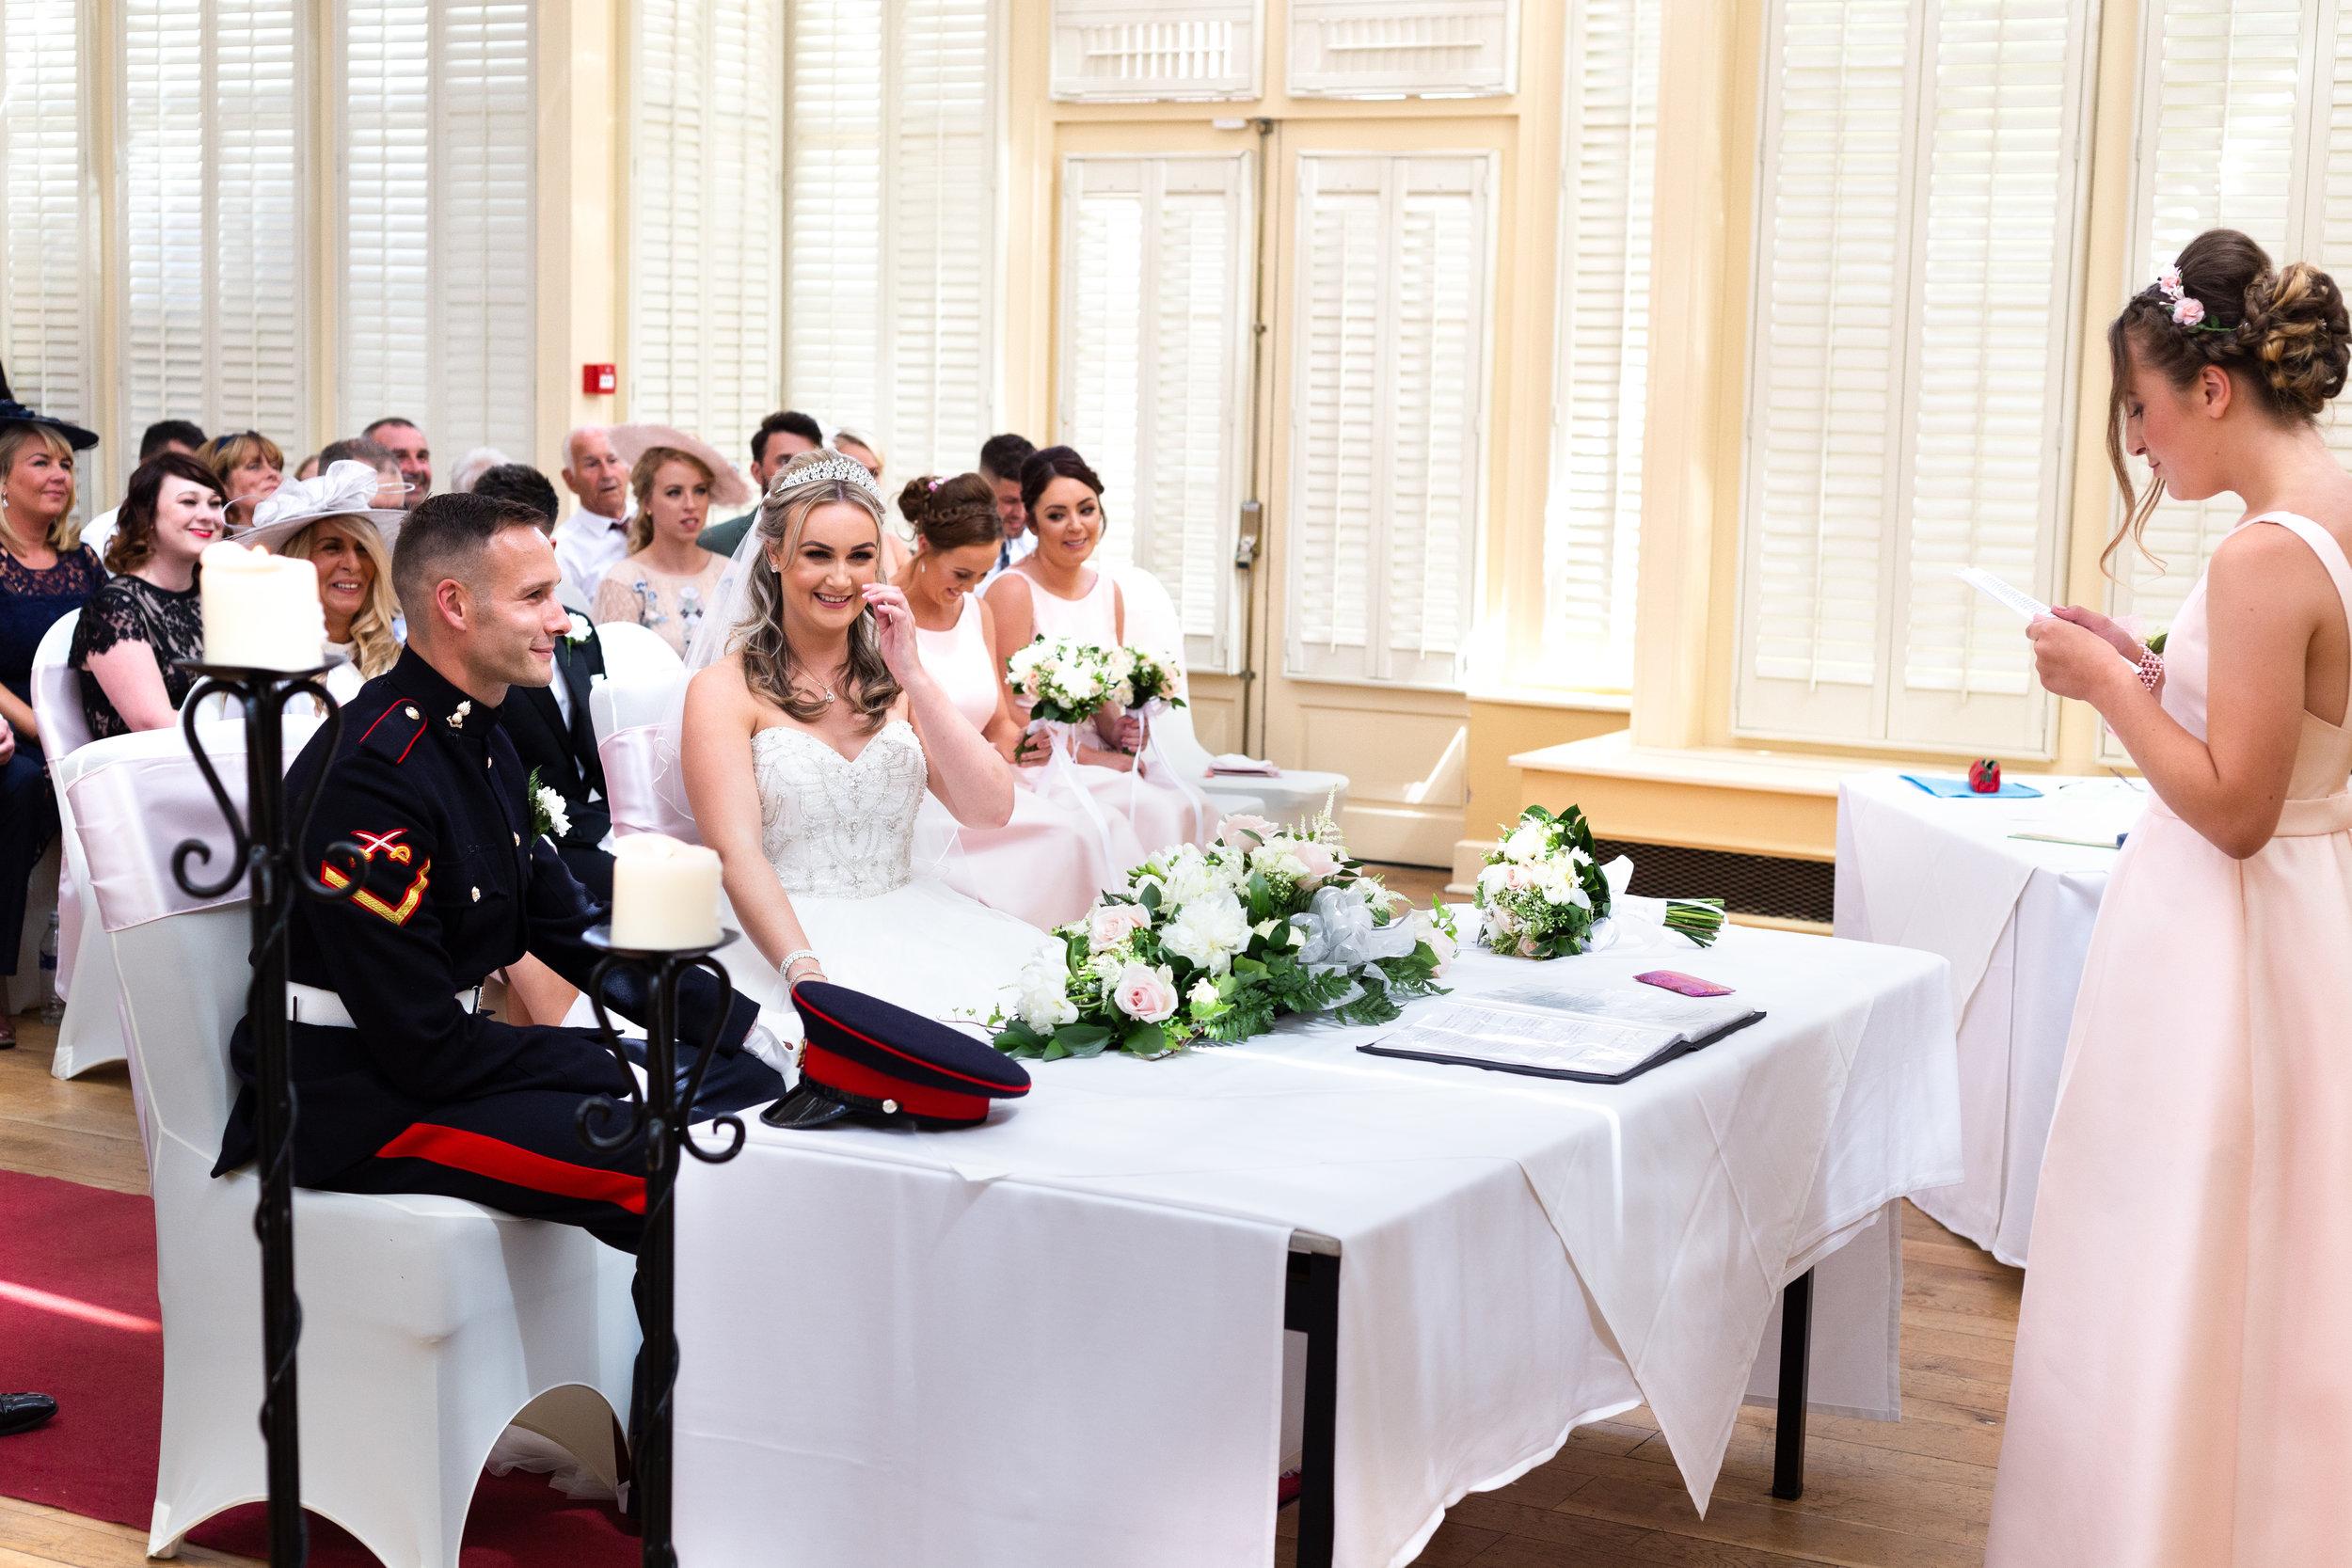 wedding-lea-cooper-photography-willenhall-west-midlands-wolverhampton-dudley-birmingham-uk-marriage-hadley-park-east-telford-speech.jpg